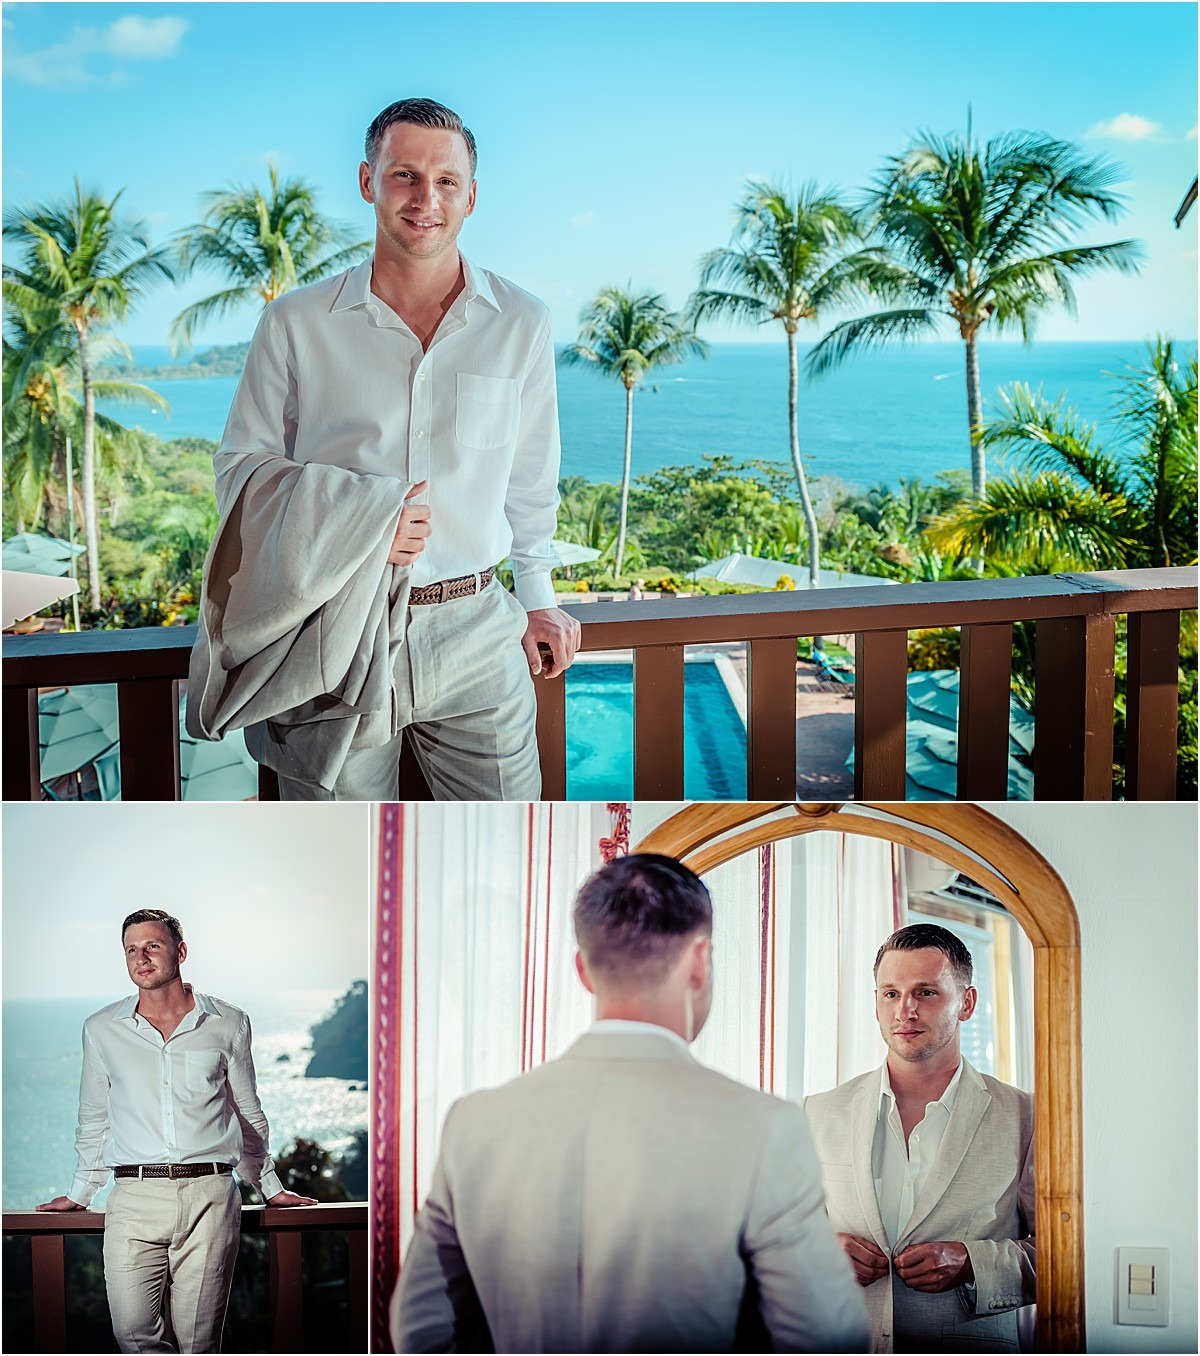 groom getting ready tan suit